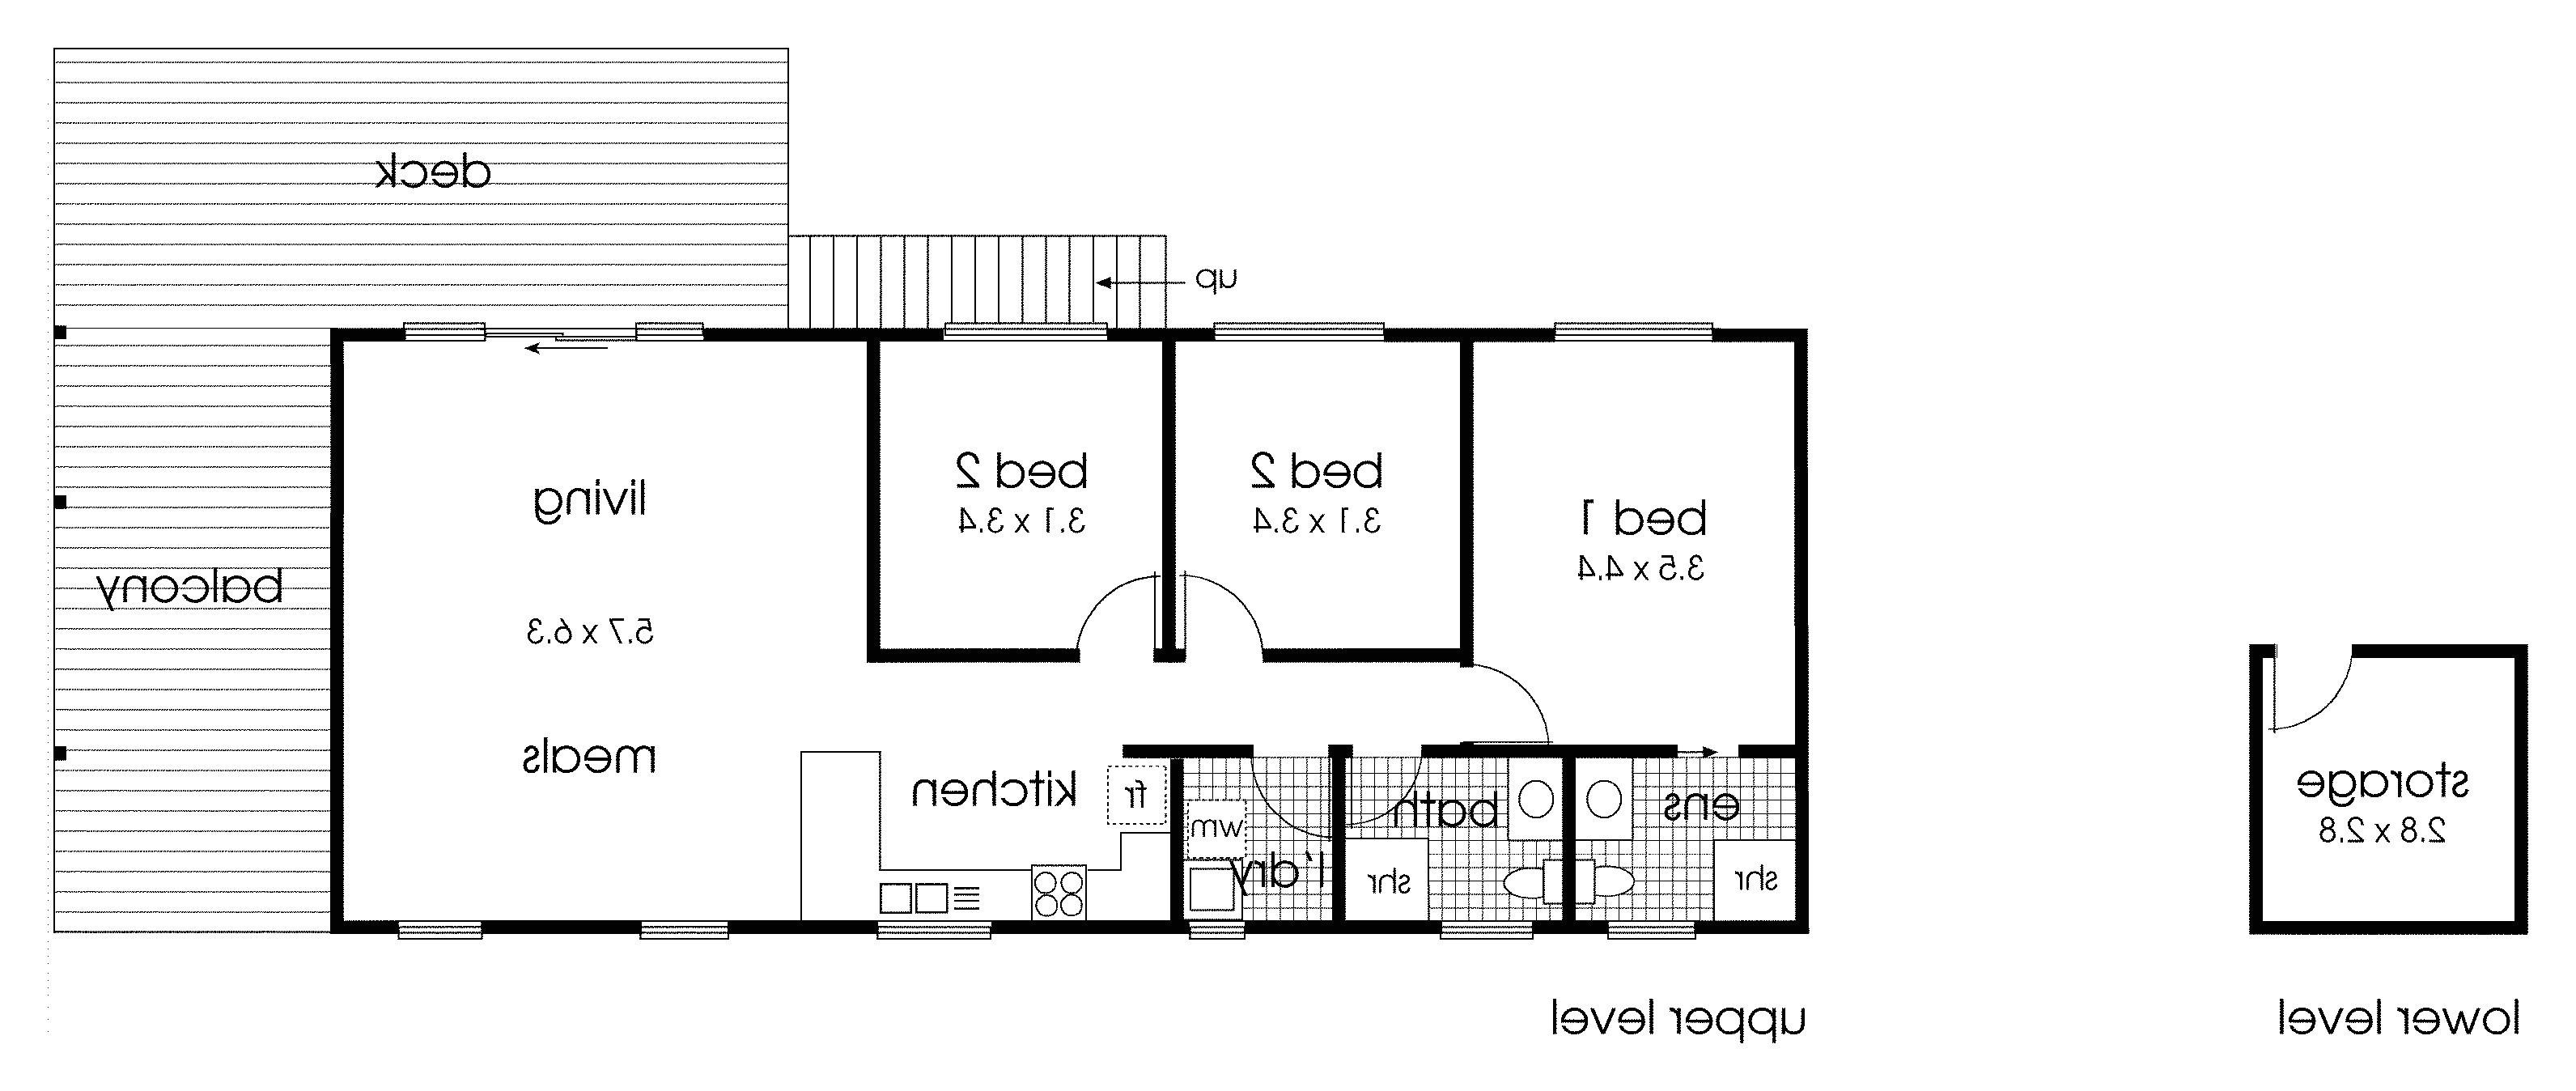 Lowes Floor Scraper Lowes Floor Plans House Elegant How to Design A House Floor Plan New